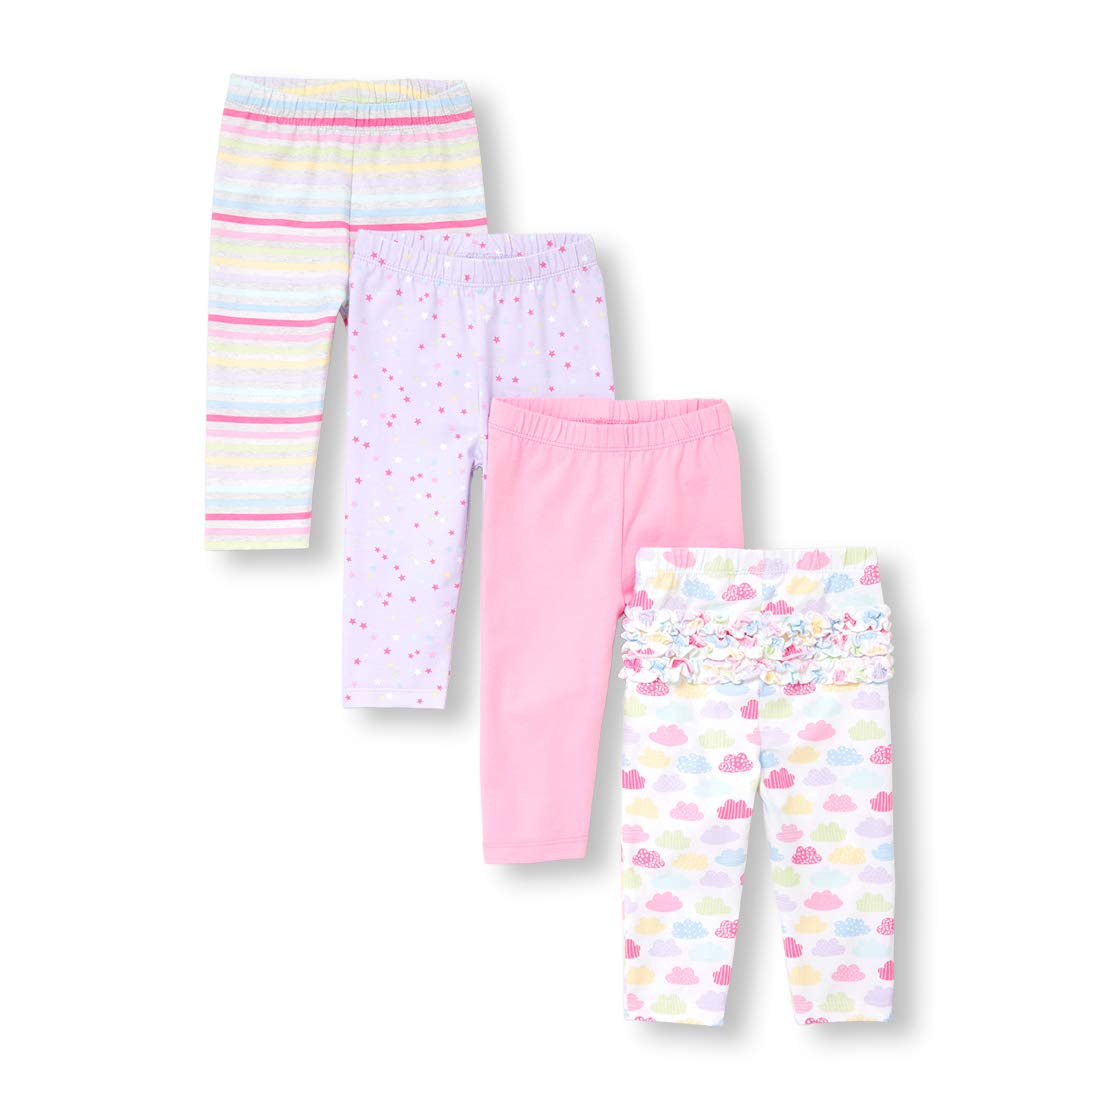 The Children's Place Baby Girls Printed Legging Set